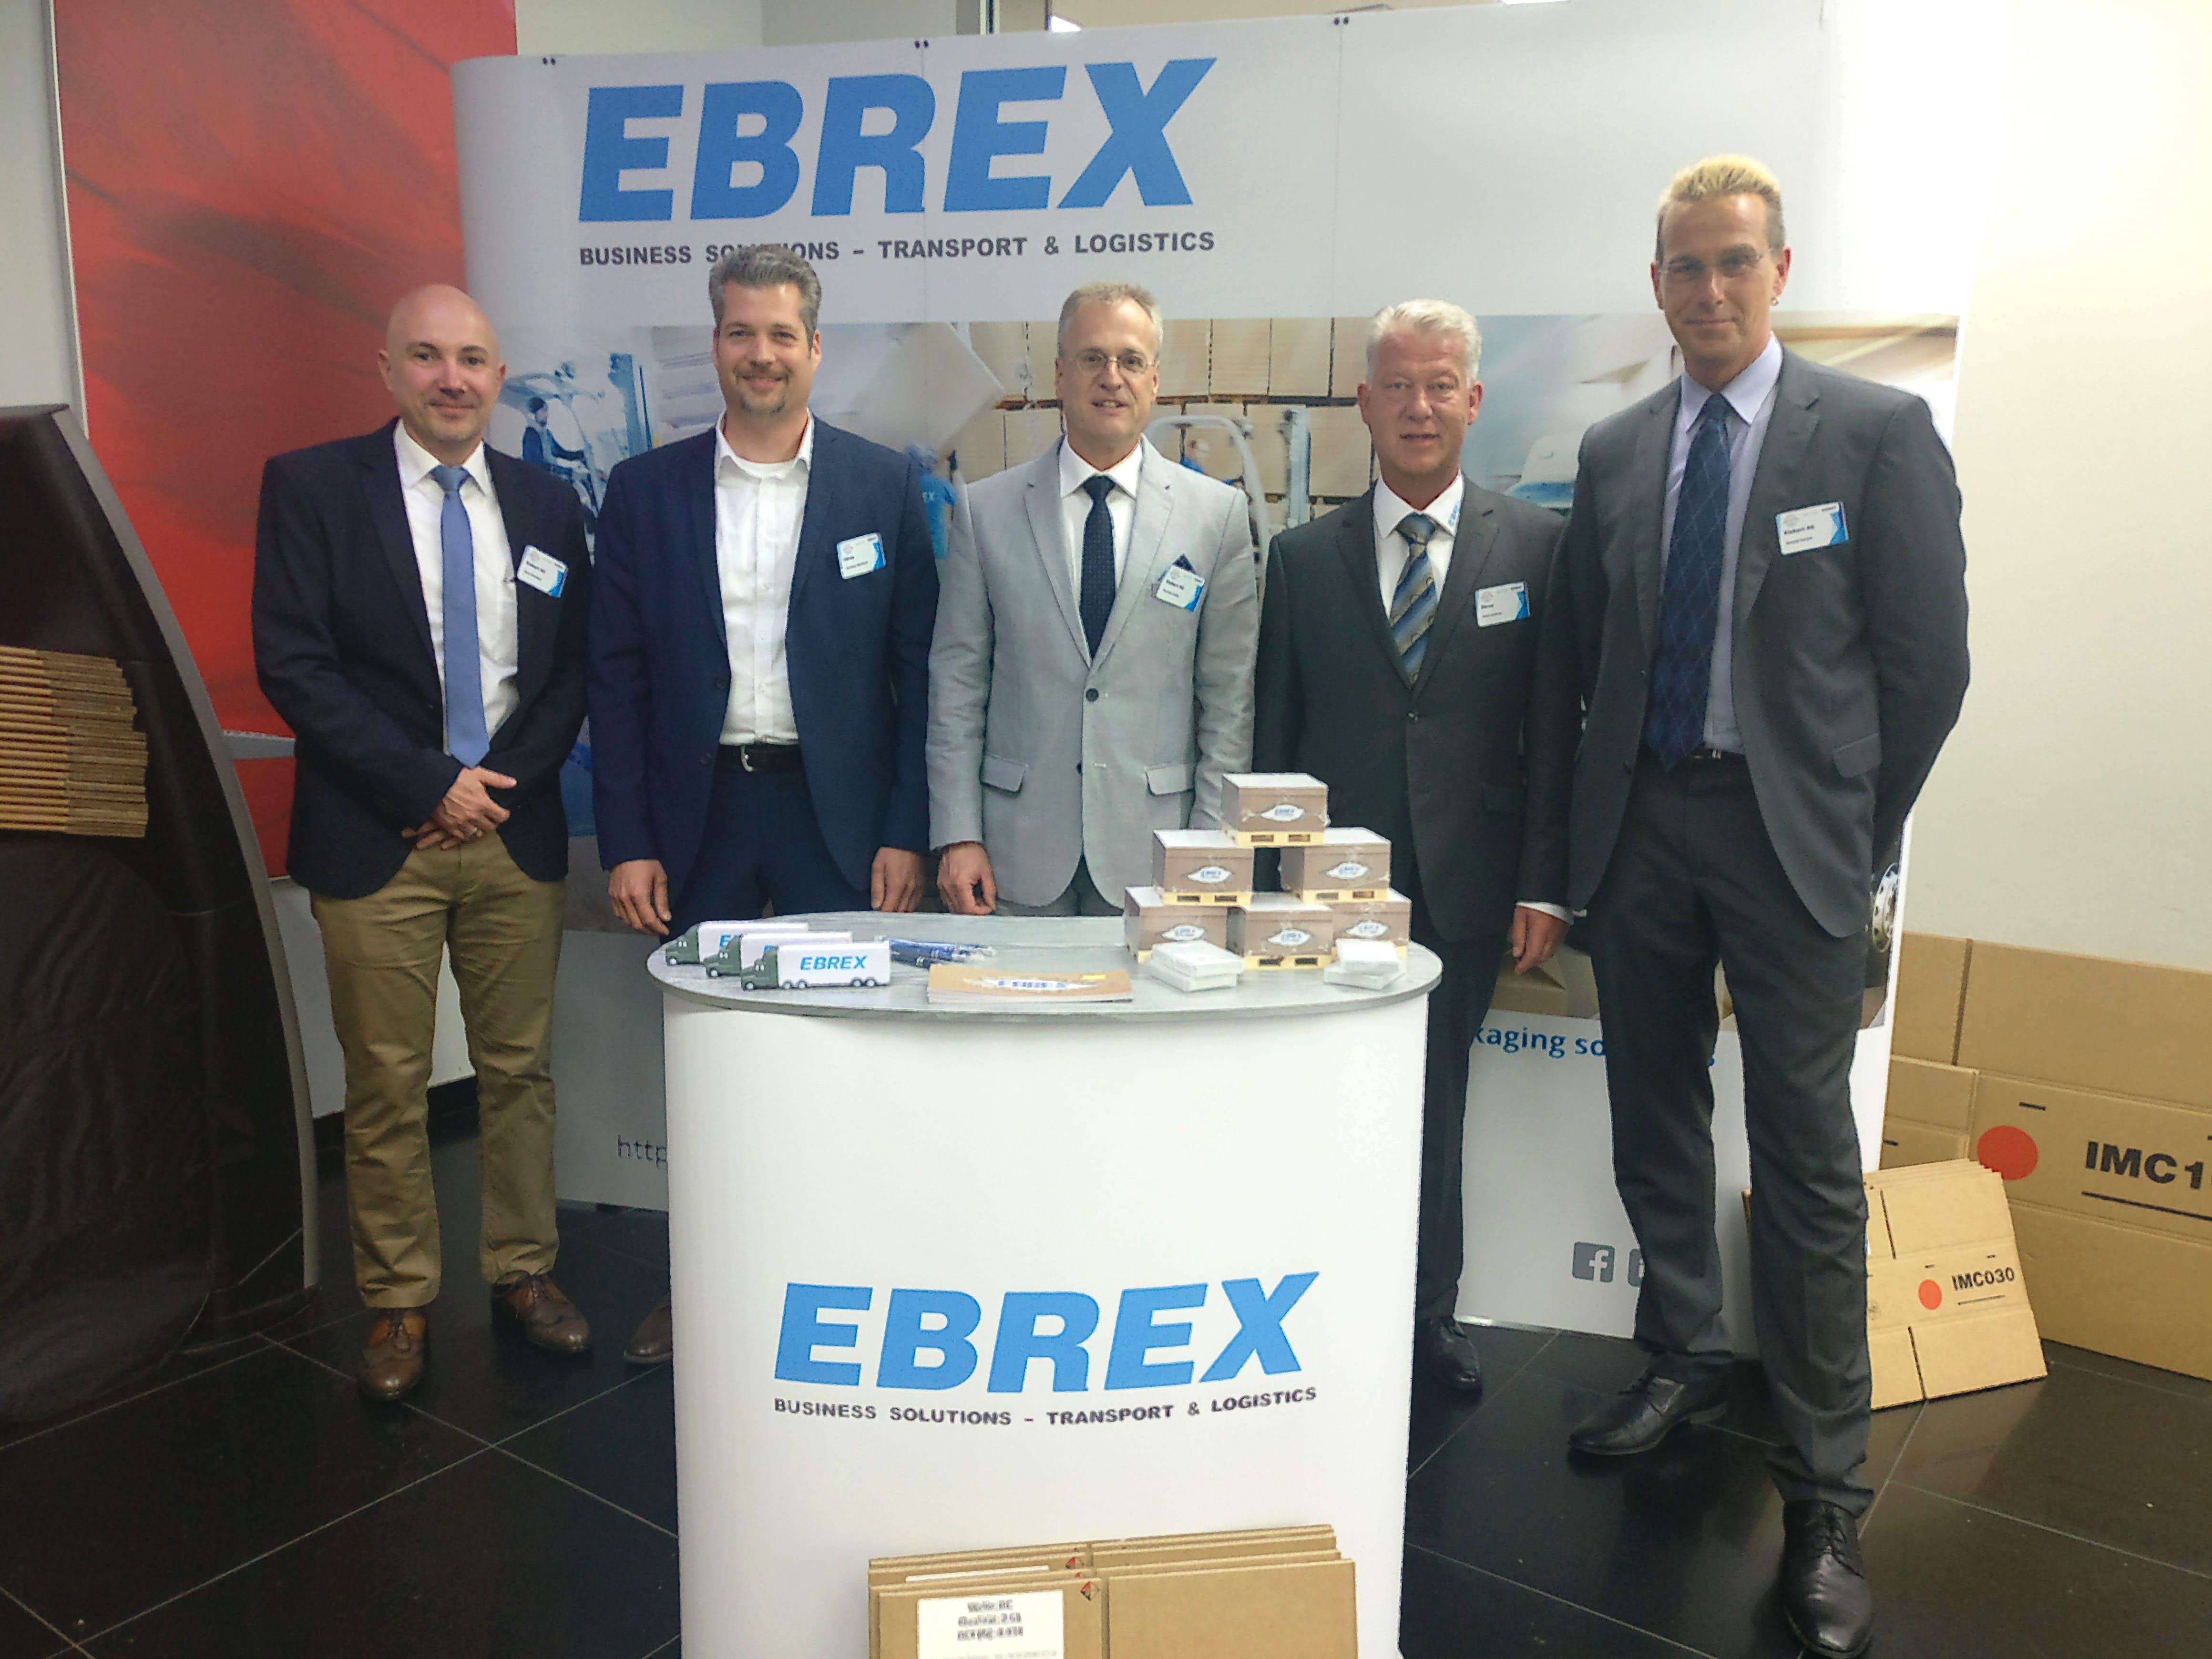 Ebrex Packaging Solutions beim europäischen Logistiktag